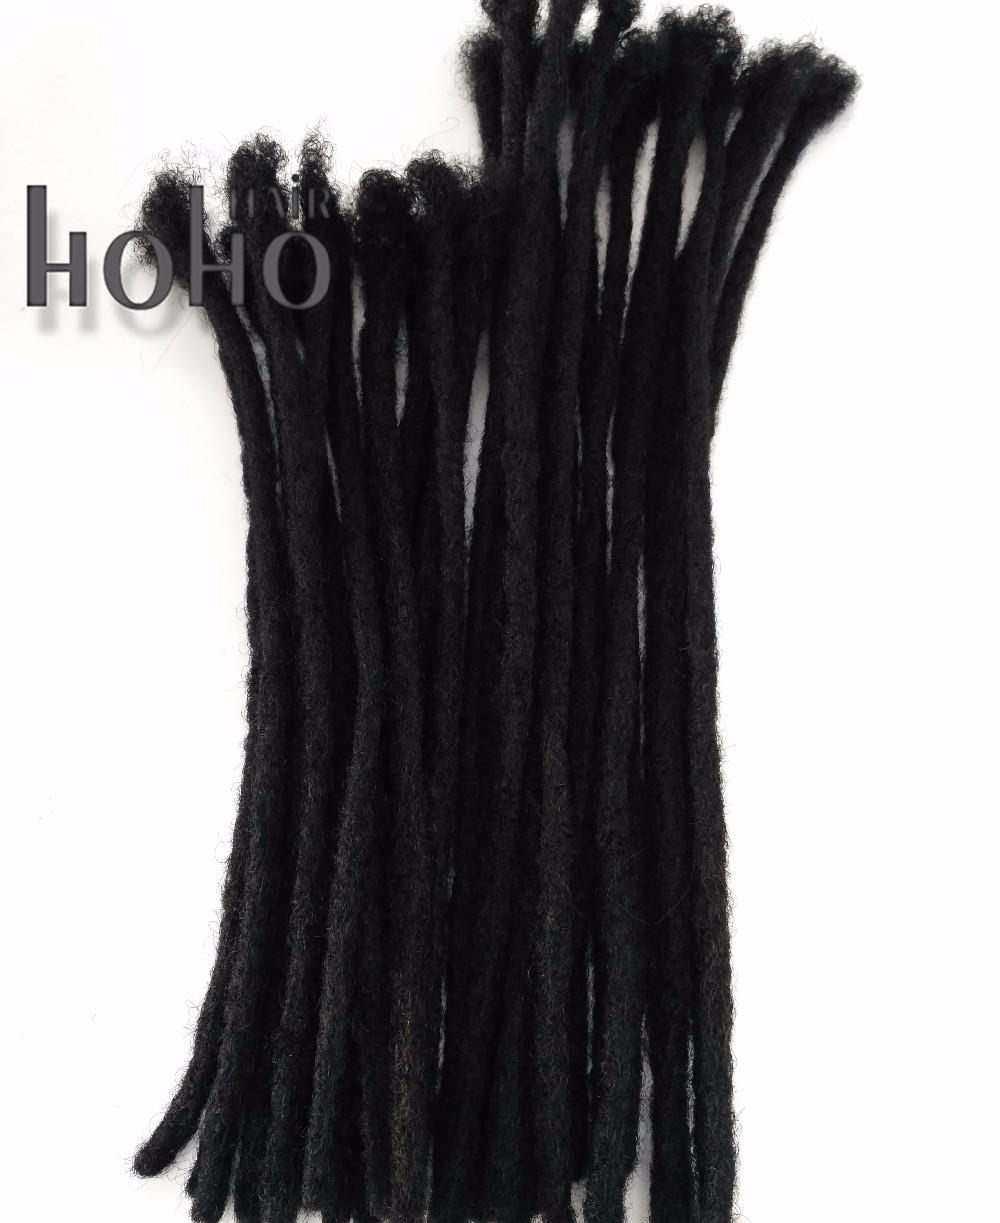 [Rheas HOHO DREADS] 20 Inches human Hair Extensions afro kinky Crochet Dreadlocks фото